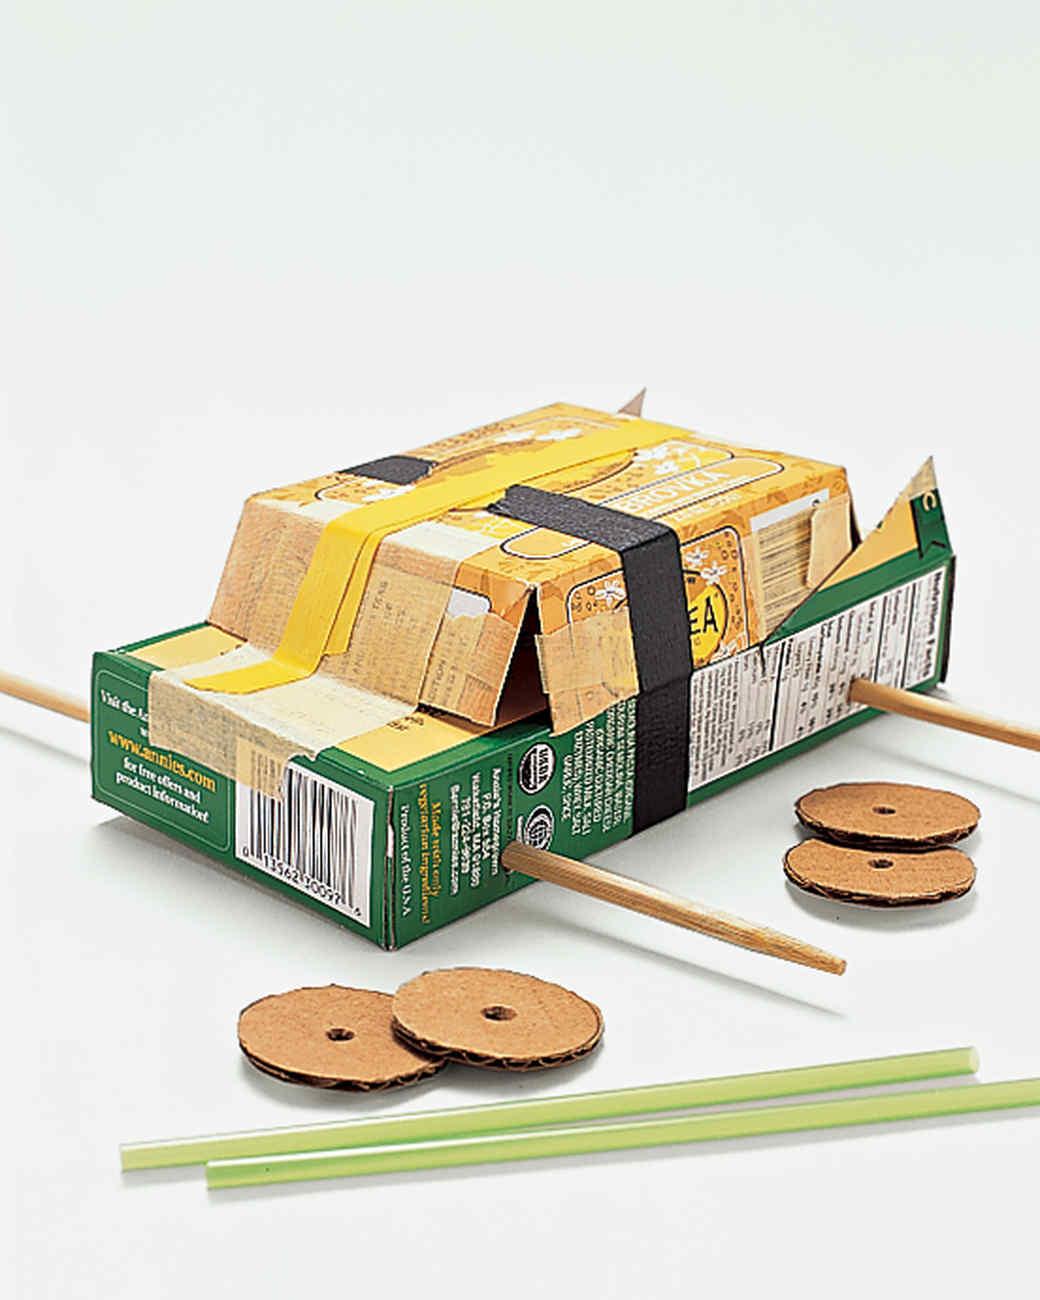 Papier mache vehicles martha stewart for How do you make paper mache glue at home